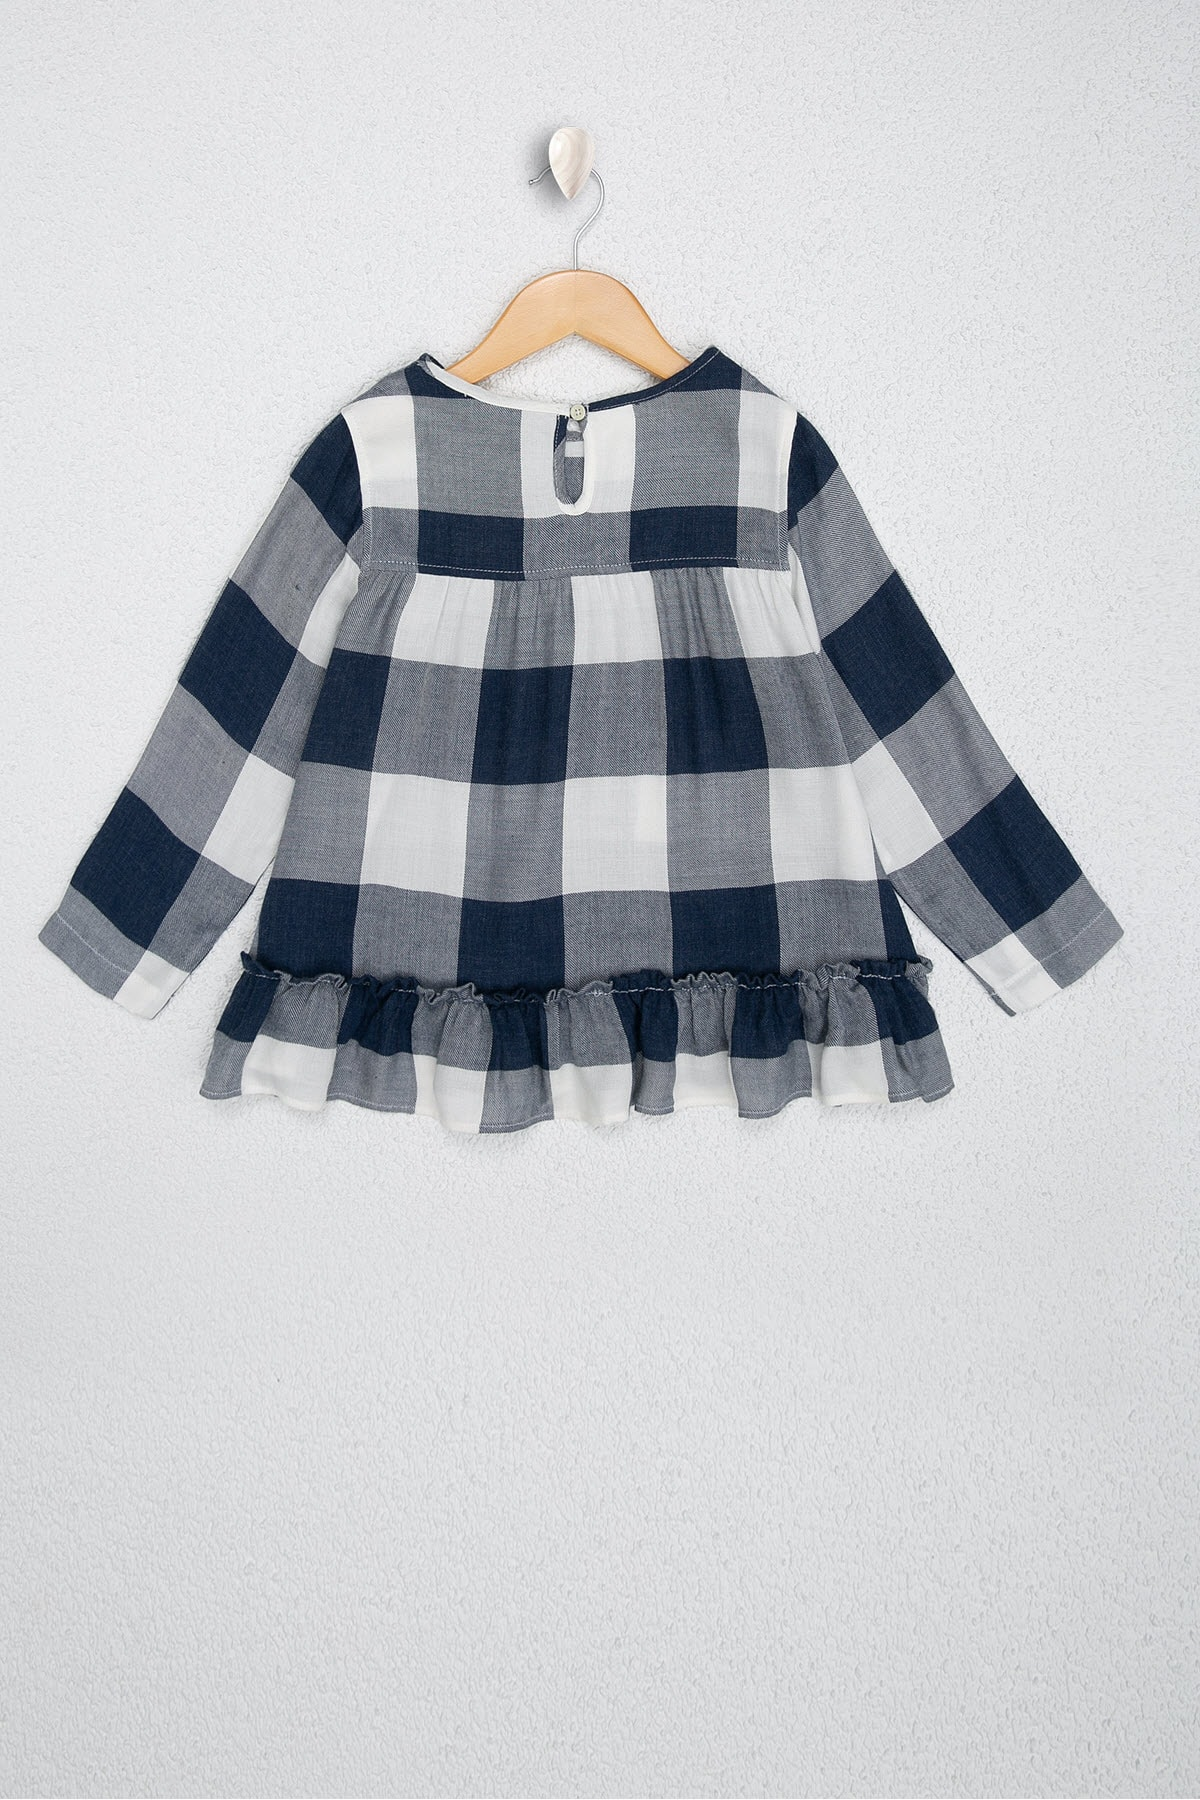 U.S. Polo Assn. Lacivert Kız Çocuk Dokuma Gömlek 2